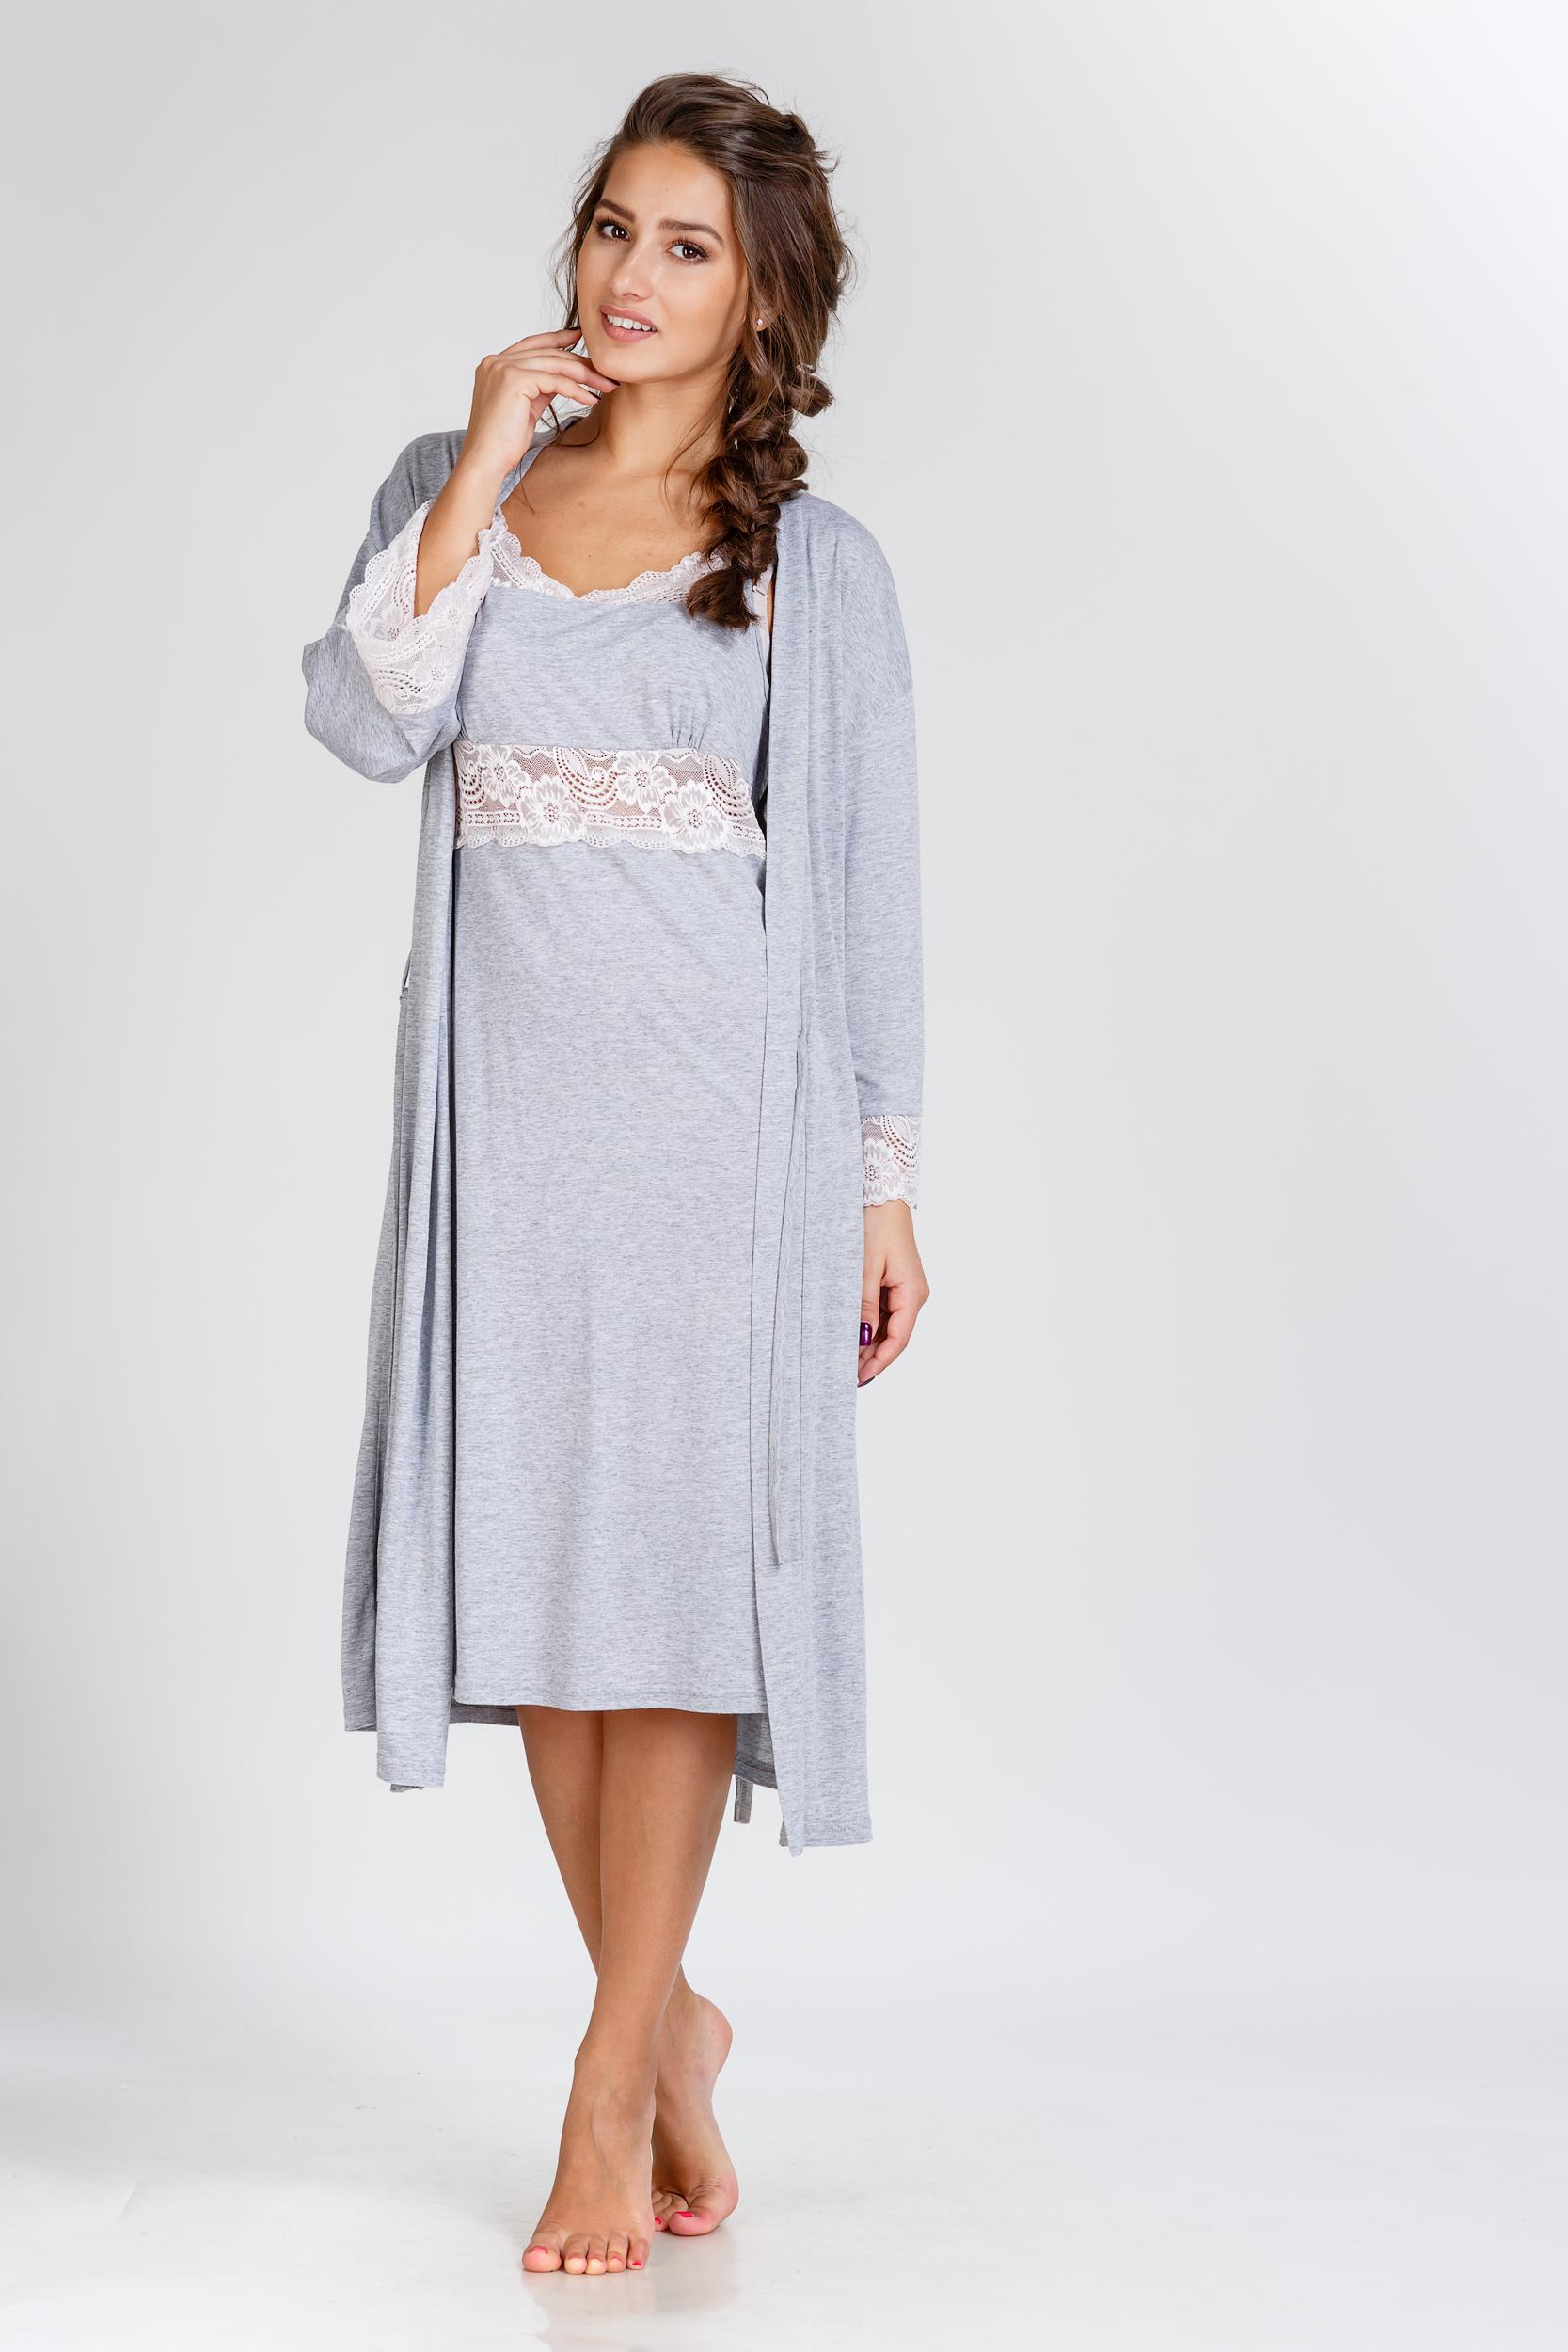 Домашние халаты Pastilla Домашний халат Ласса 2 Цвет: Серый Меланж (L) халаты домашние лори халат